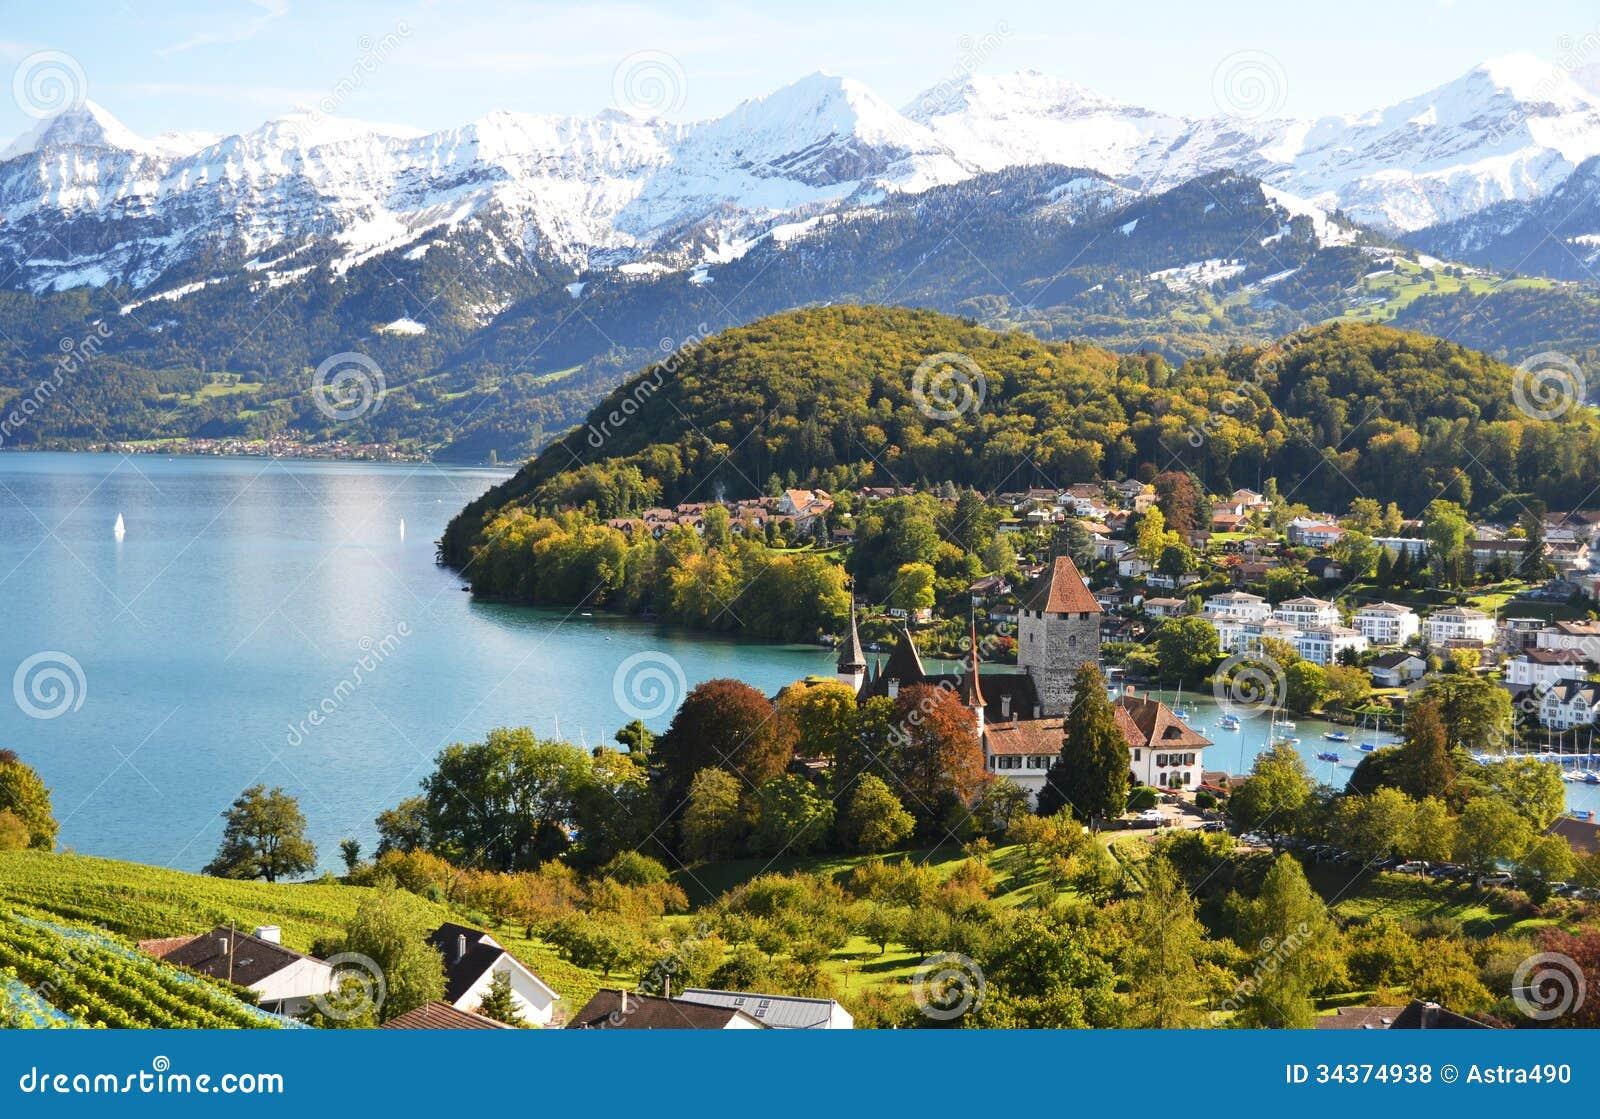 Spiez Switzerland  city photos gallery : Spiez Castle, Switzerland Royalty Free Stock Photos Image: 34374938